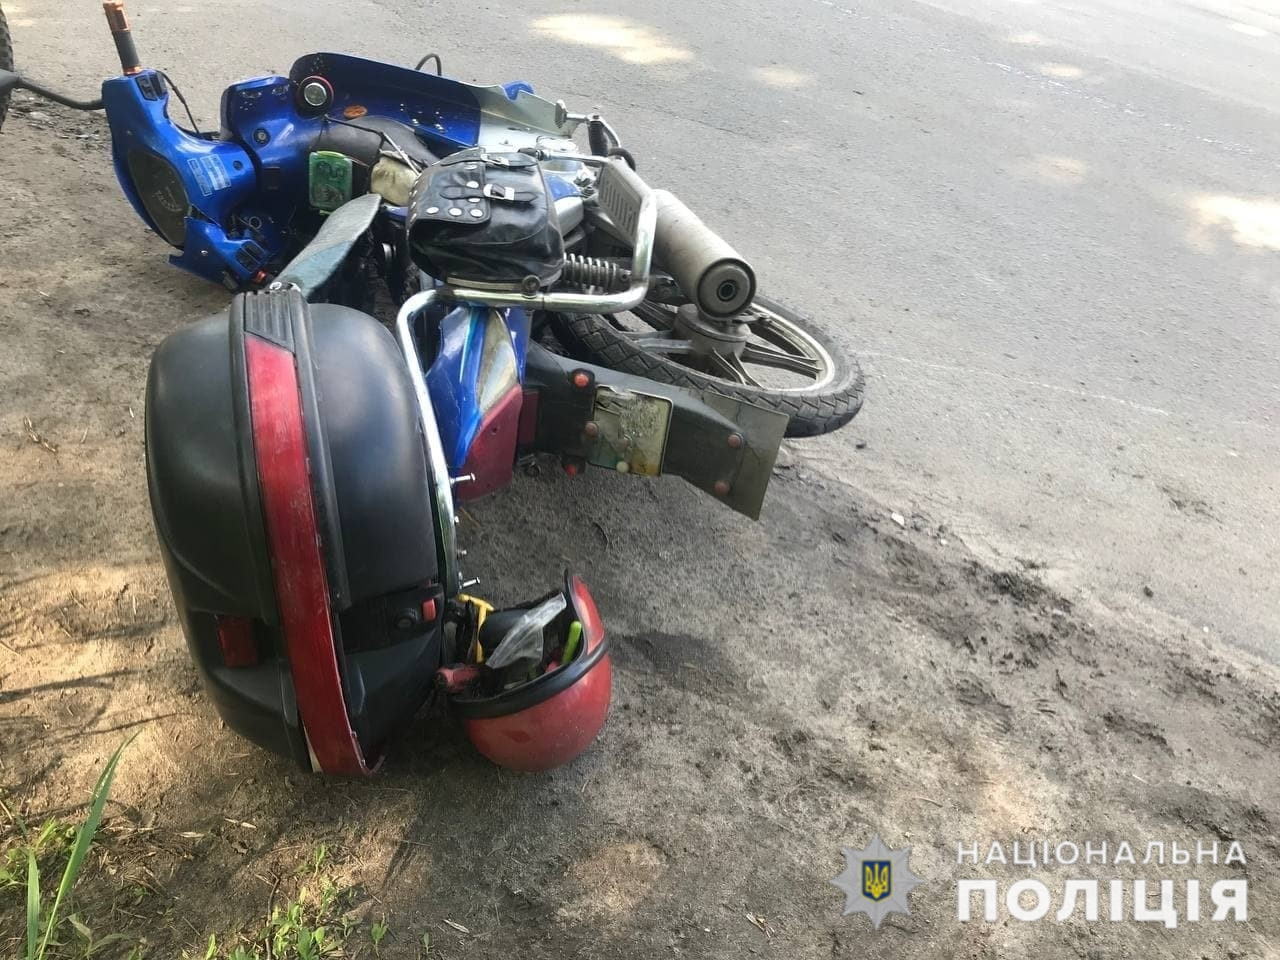 В Краматорске произошло столкновение автомобиля и мопеда